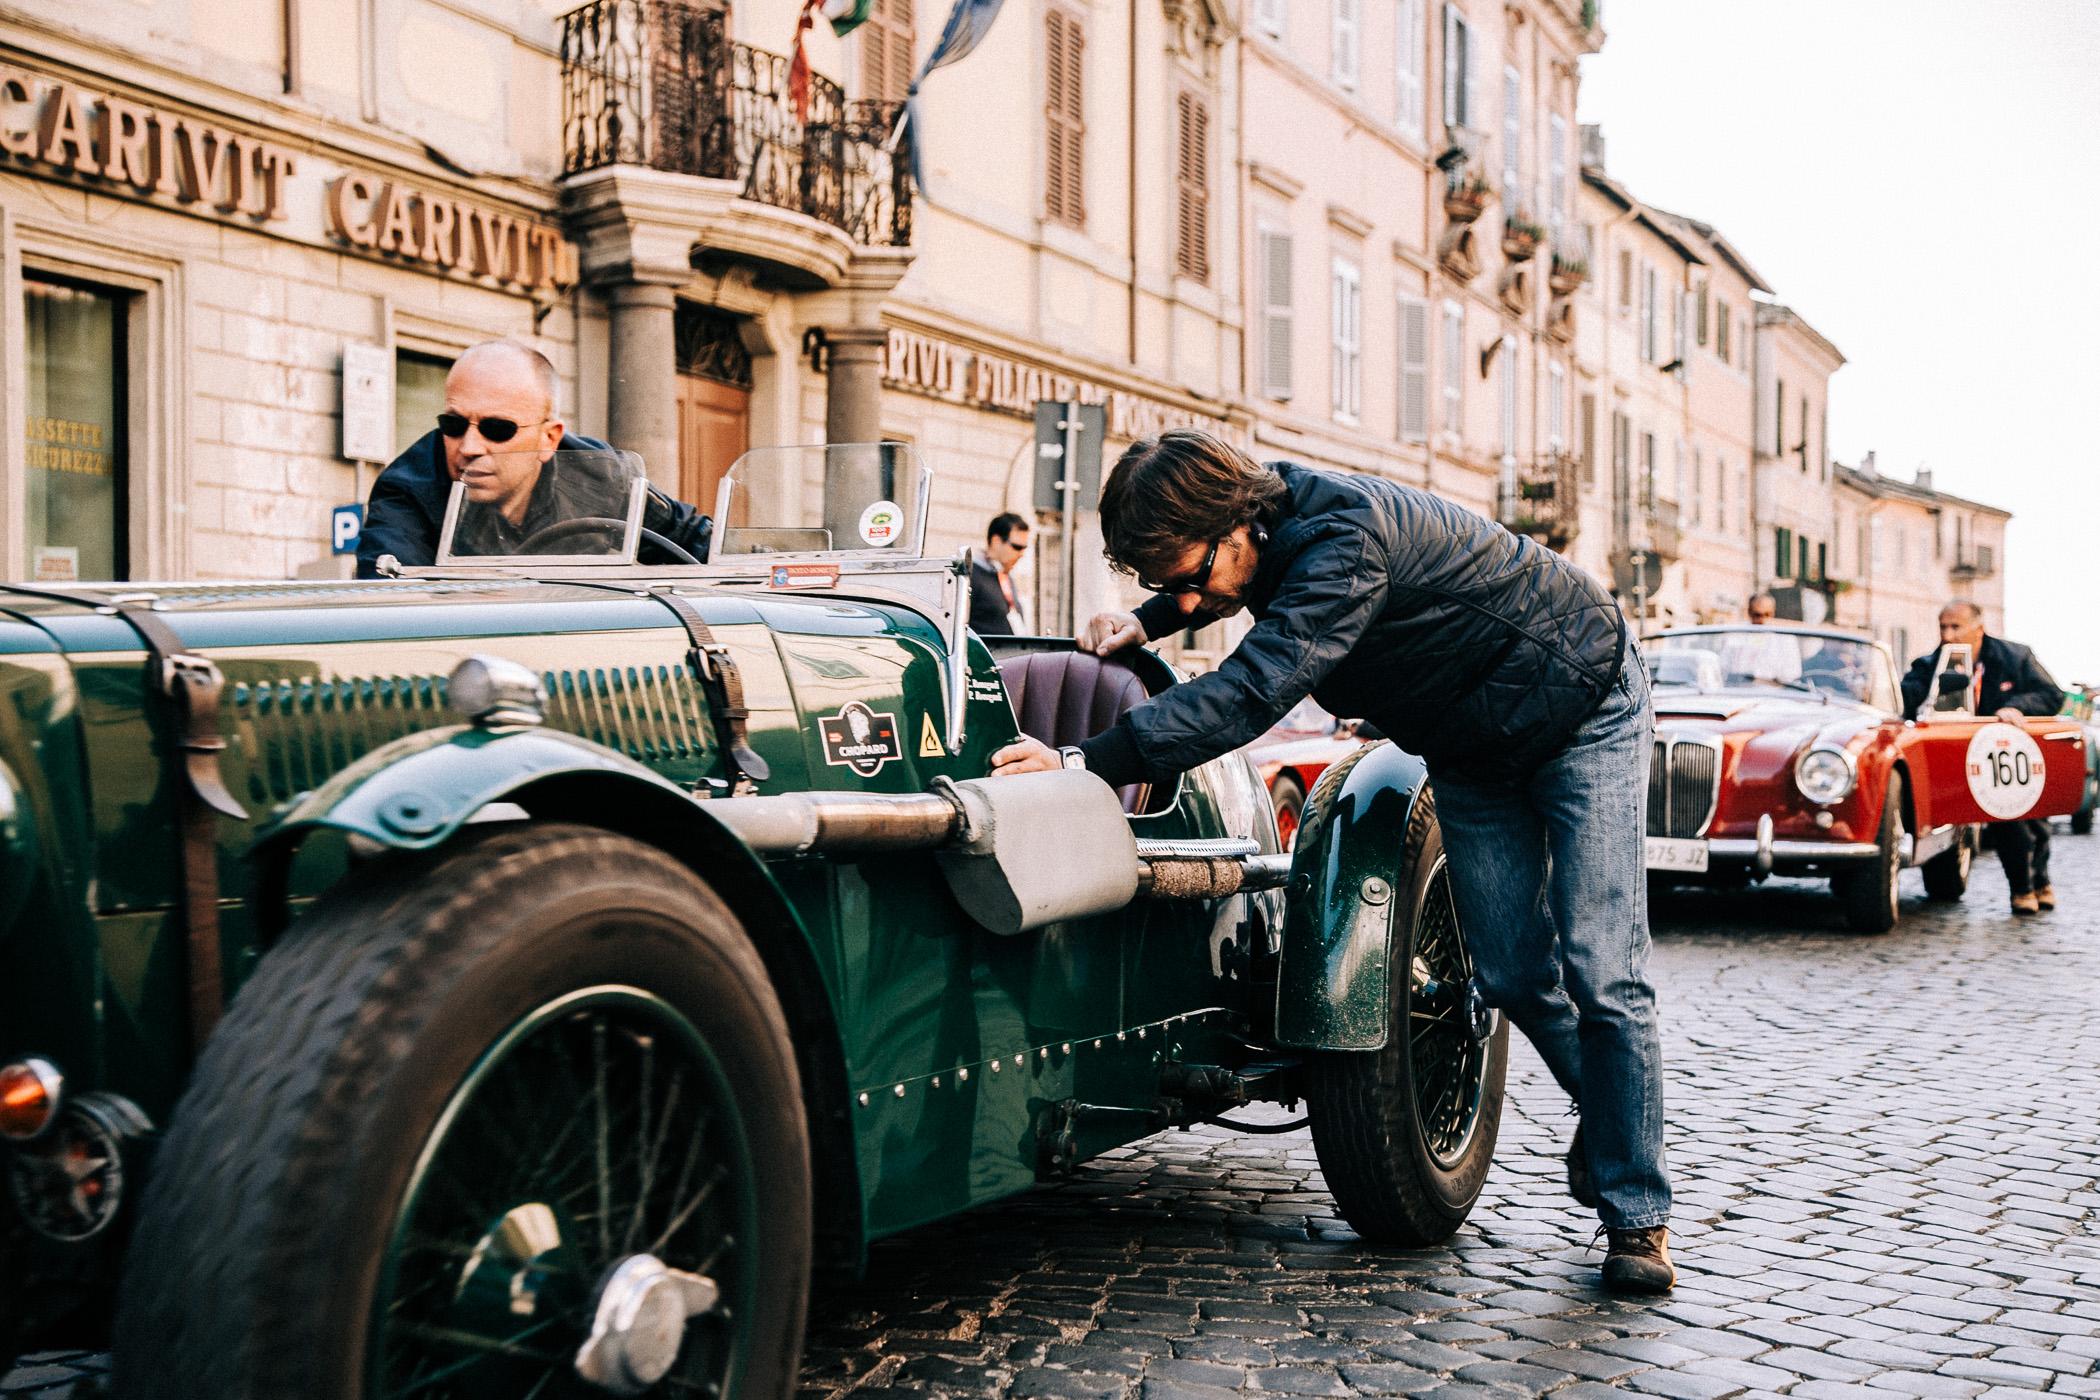 Mille Miglia, Florian Kresse, Rennfahrer, Italien, Fiat, Ferrari, Autofotografie, vintage car, Oldtimer